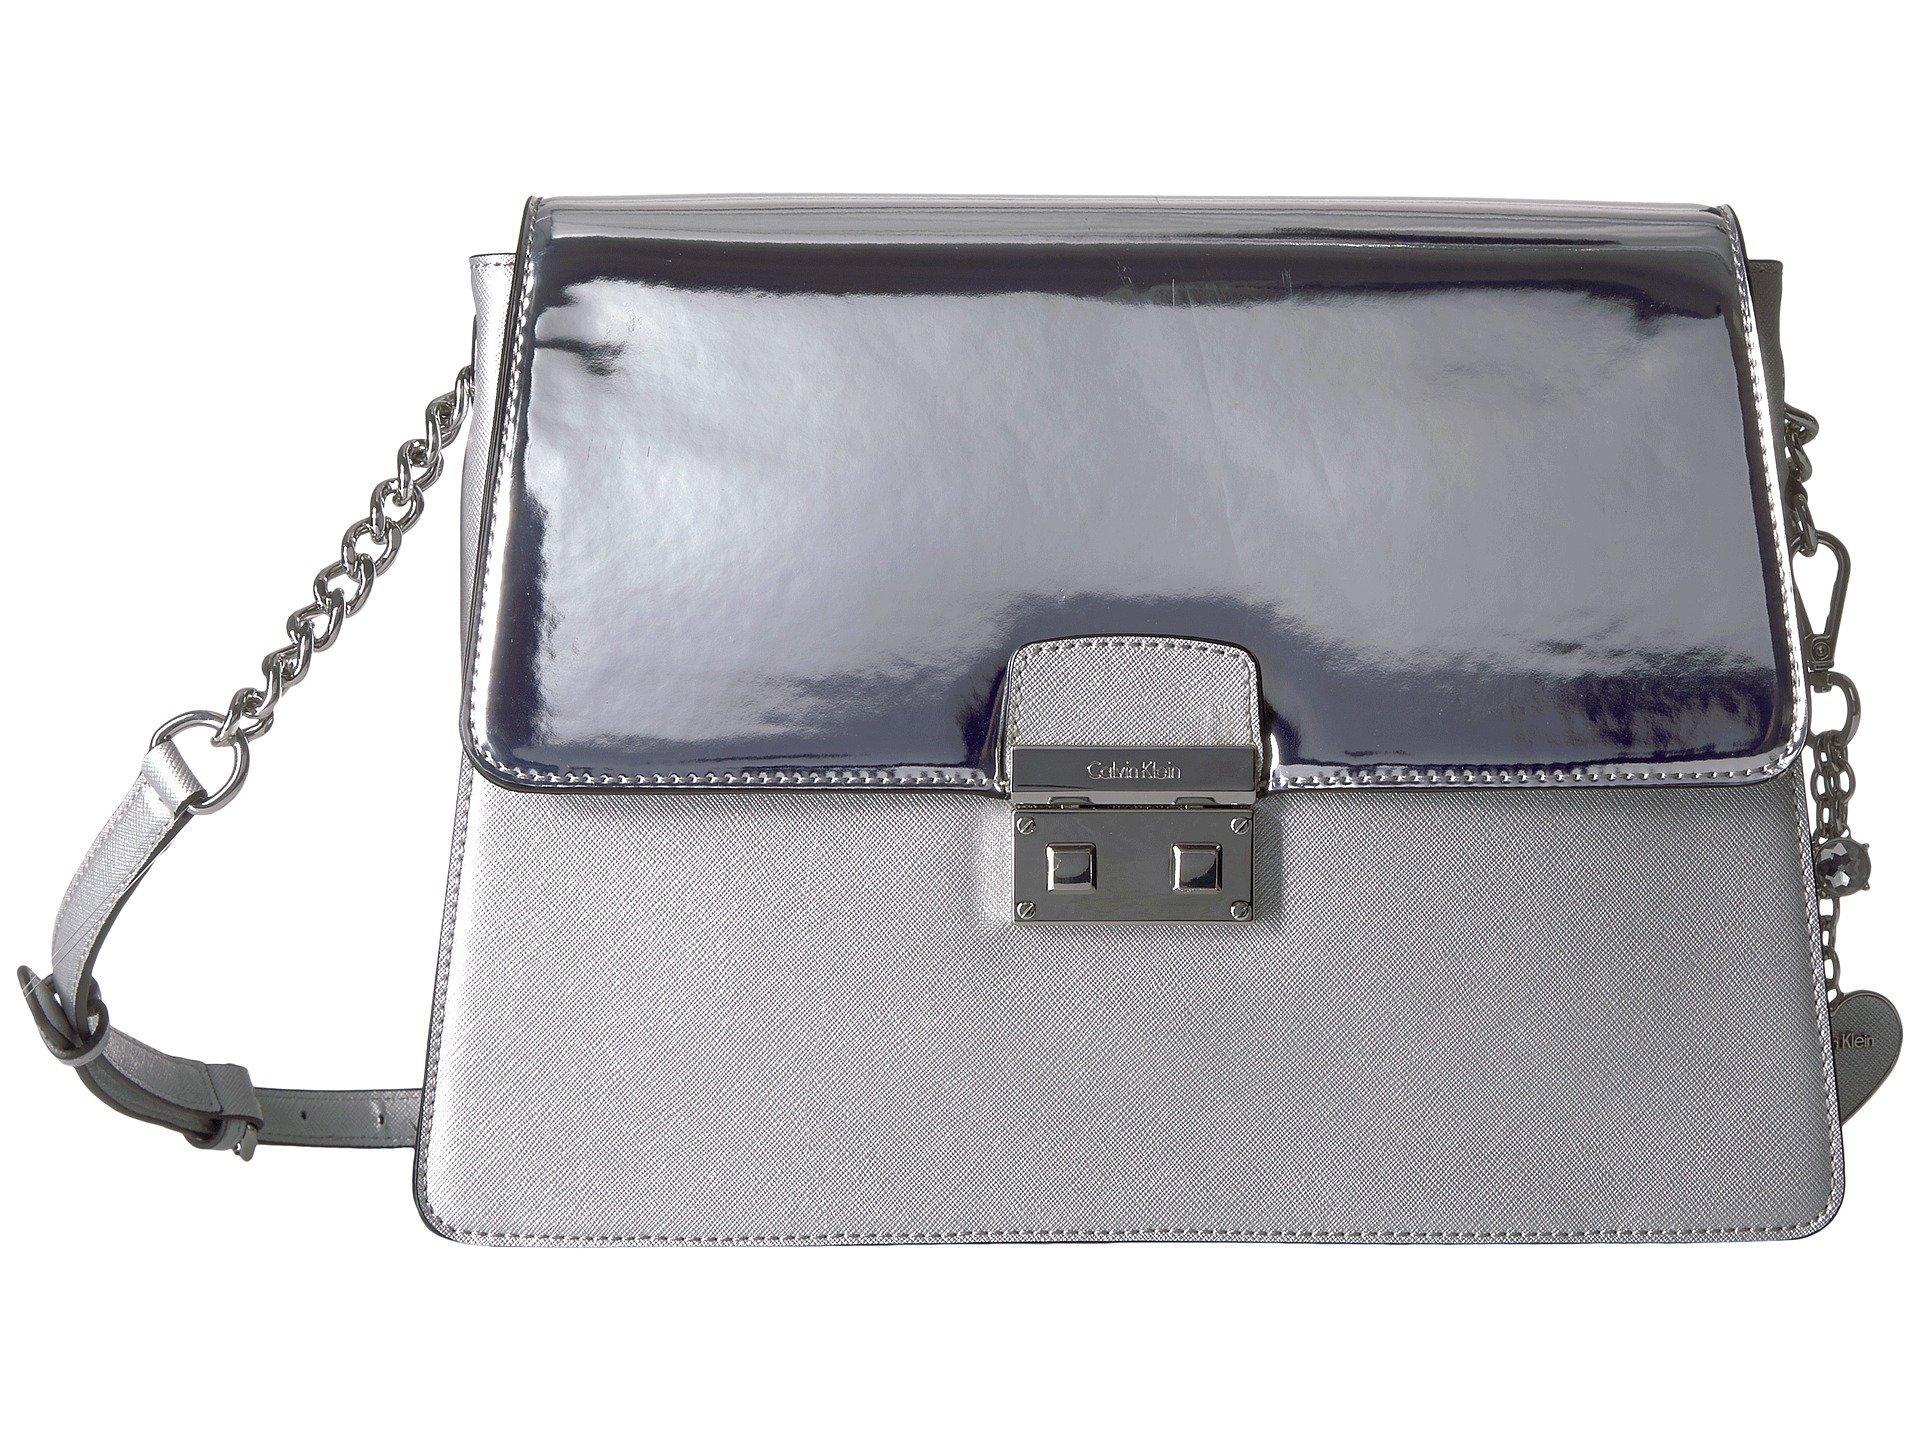 4d641bf5e3f Calvin Klein Mirrored Large Flap Crossbody In Metallic Silver | ModeSens